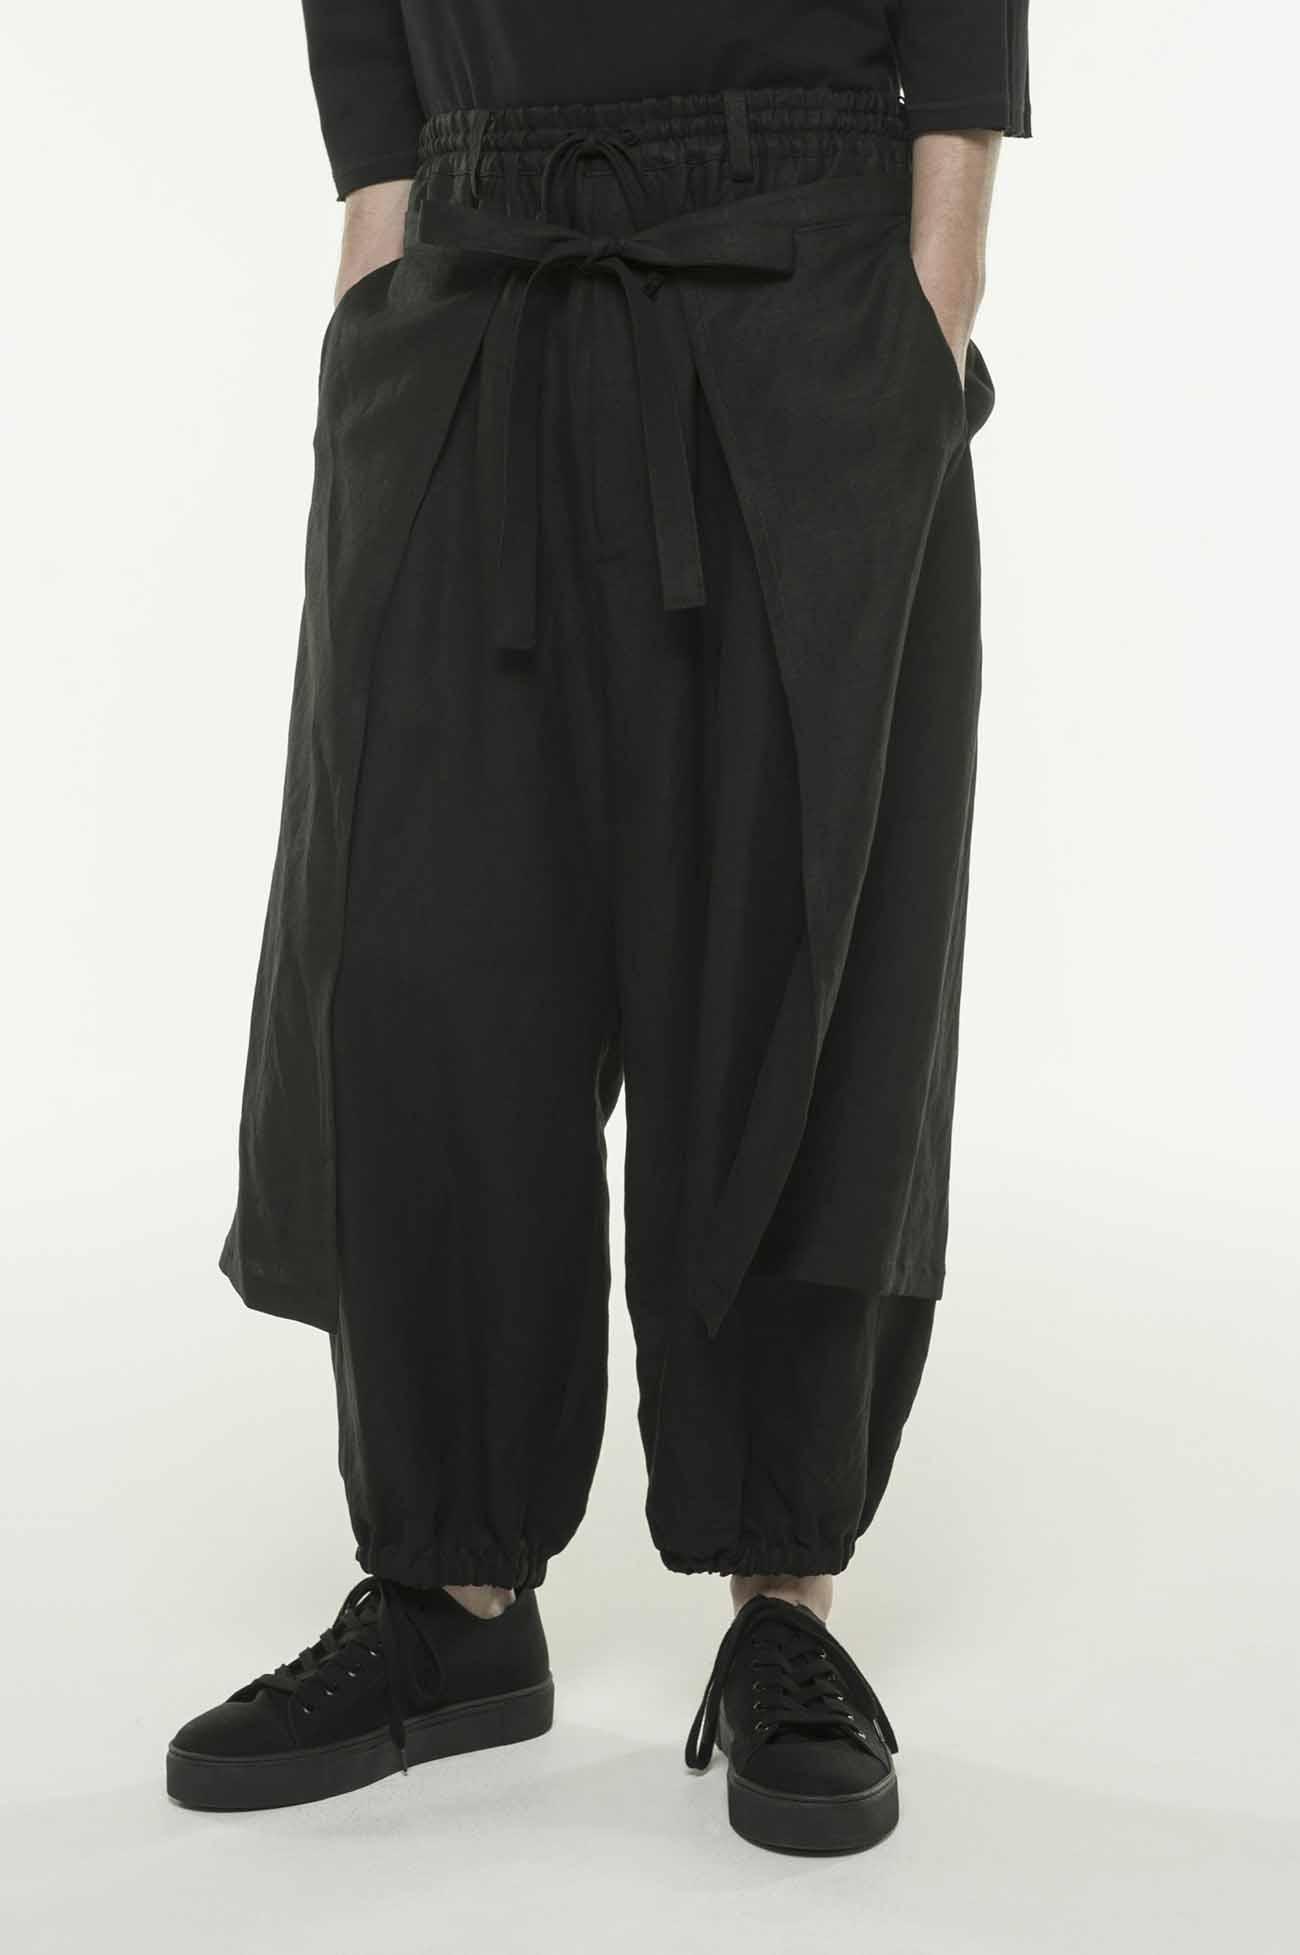 Rayon Linen Easy Cross・B Hem Both Sides Wrap Pants